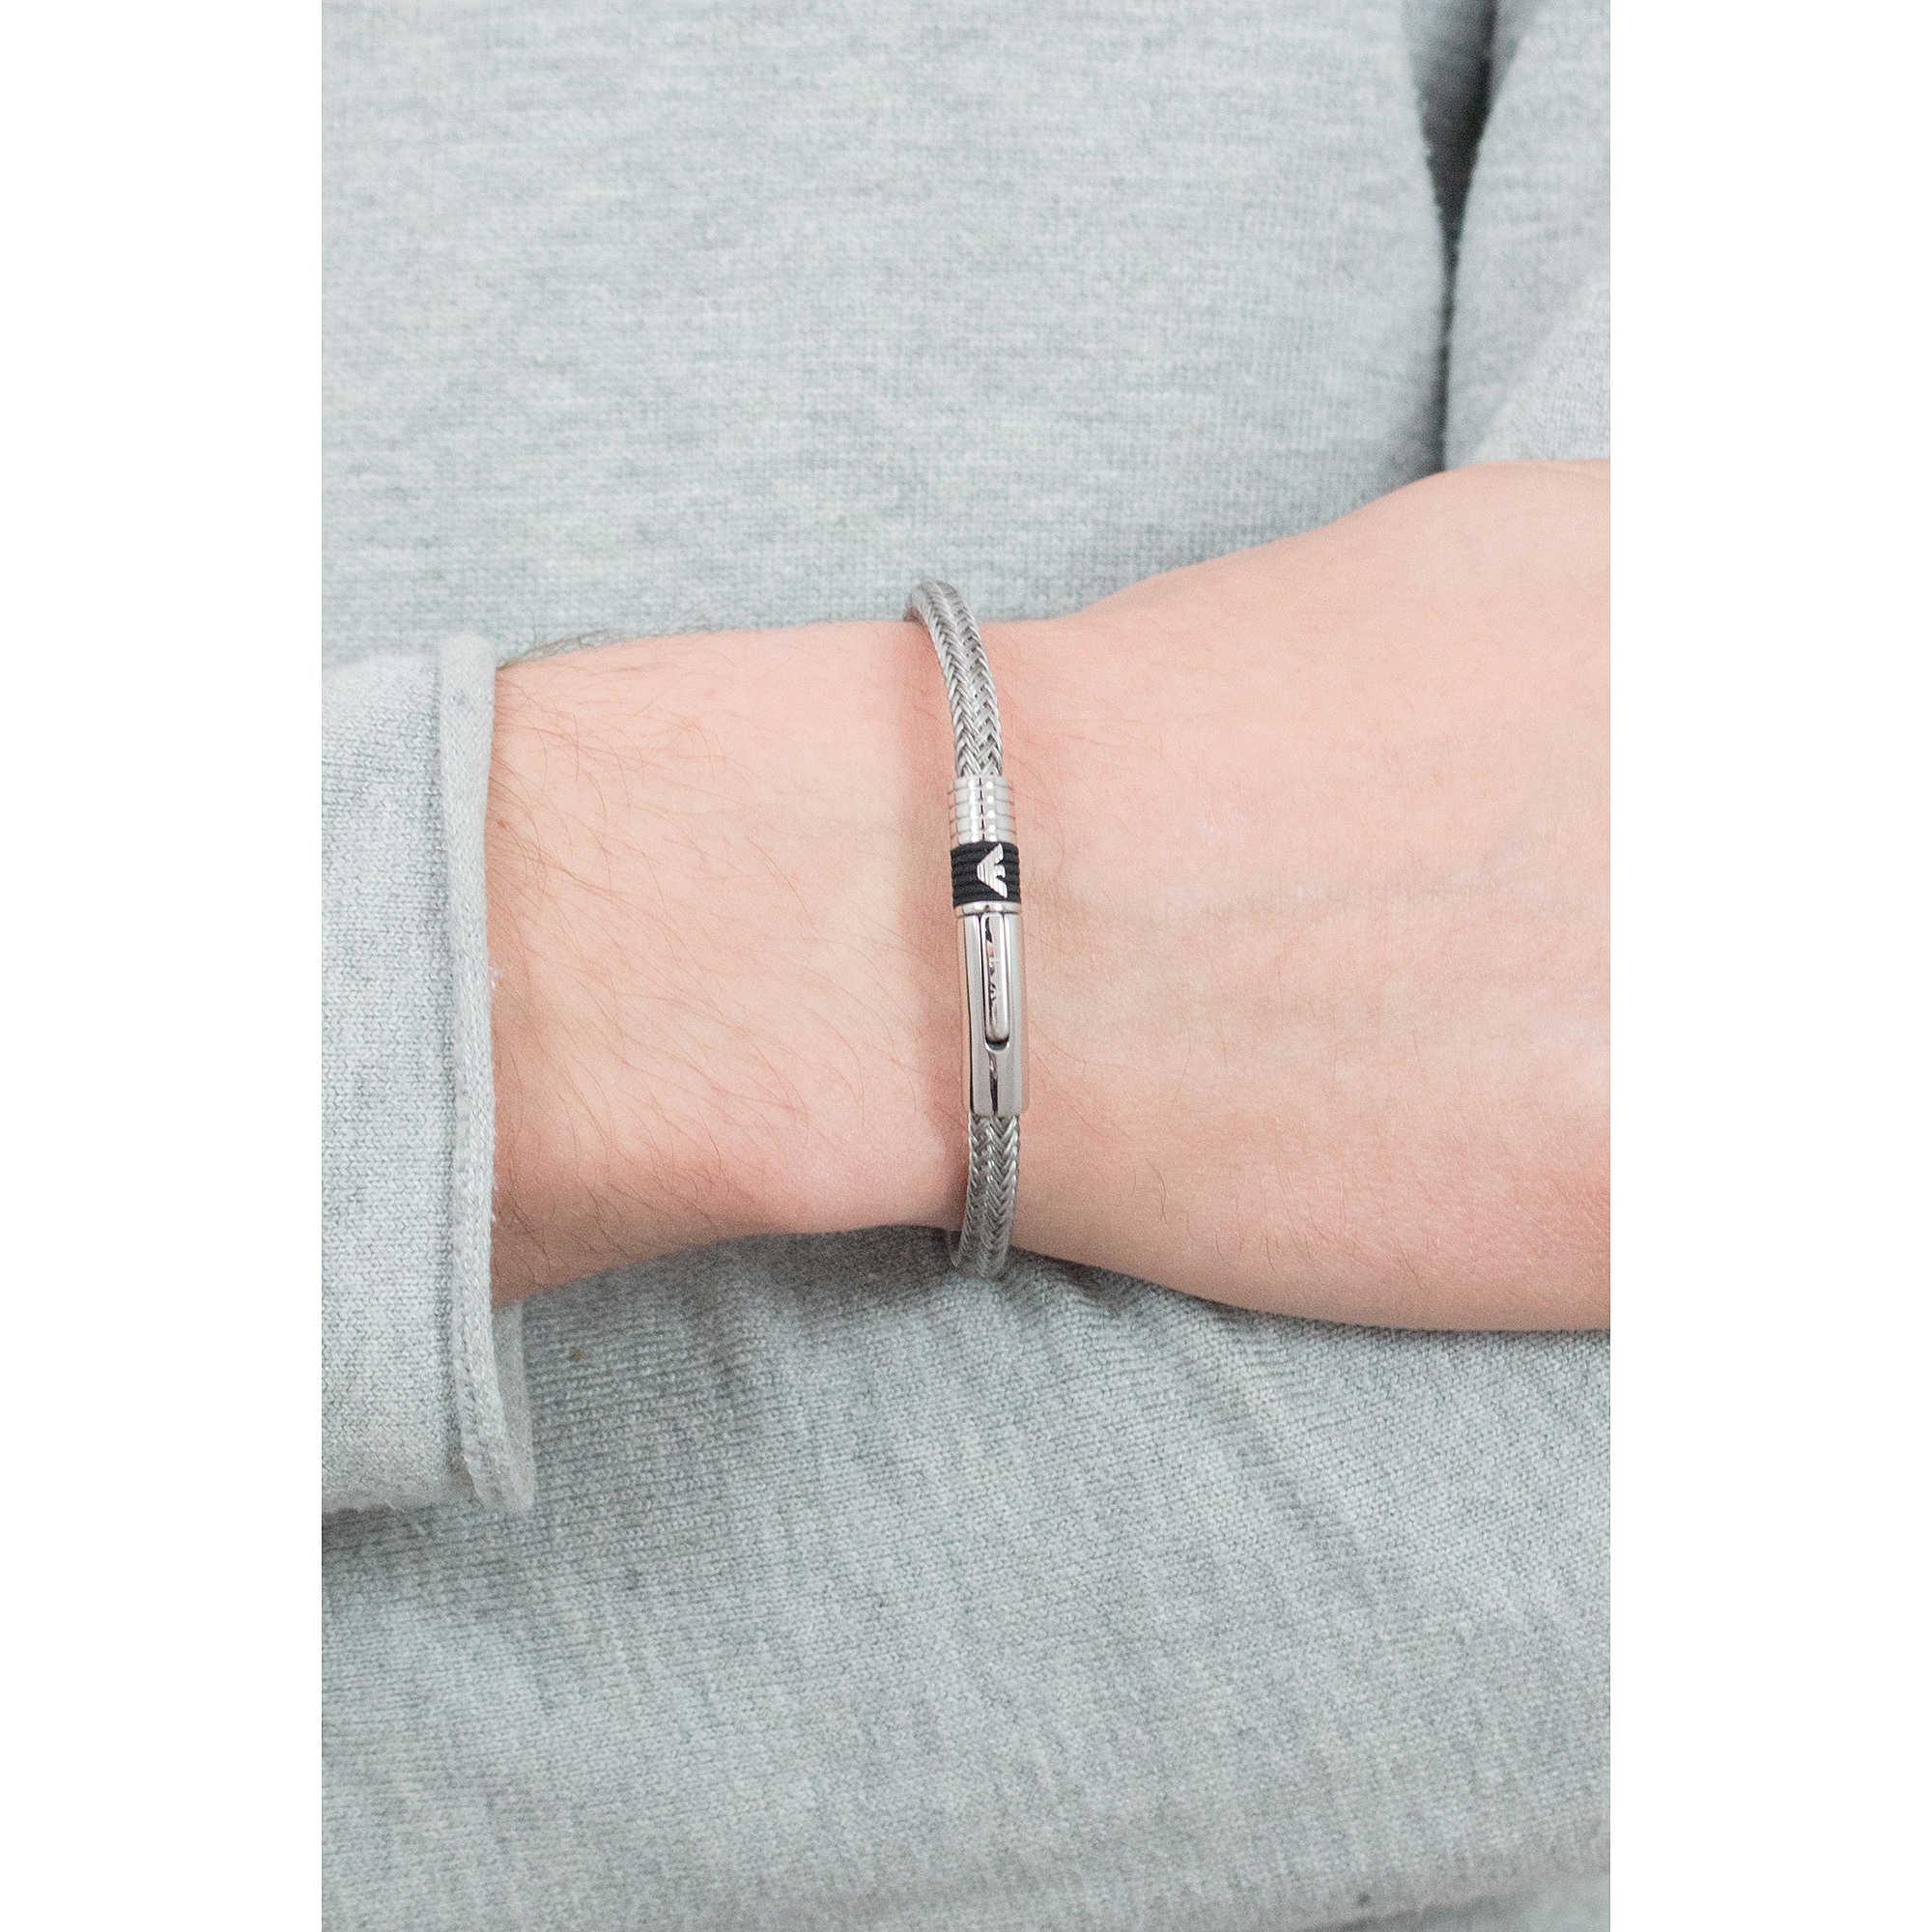 zoom. package bracelets Emporio Armani EGS162304019. zoom. bracelet man  jewellery Emporio Armani EGS162304019 a4e4ccc5635